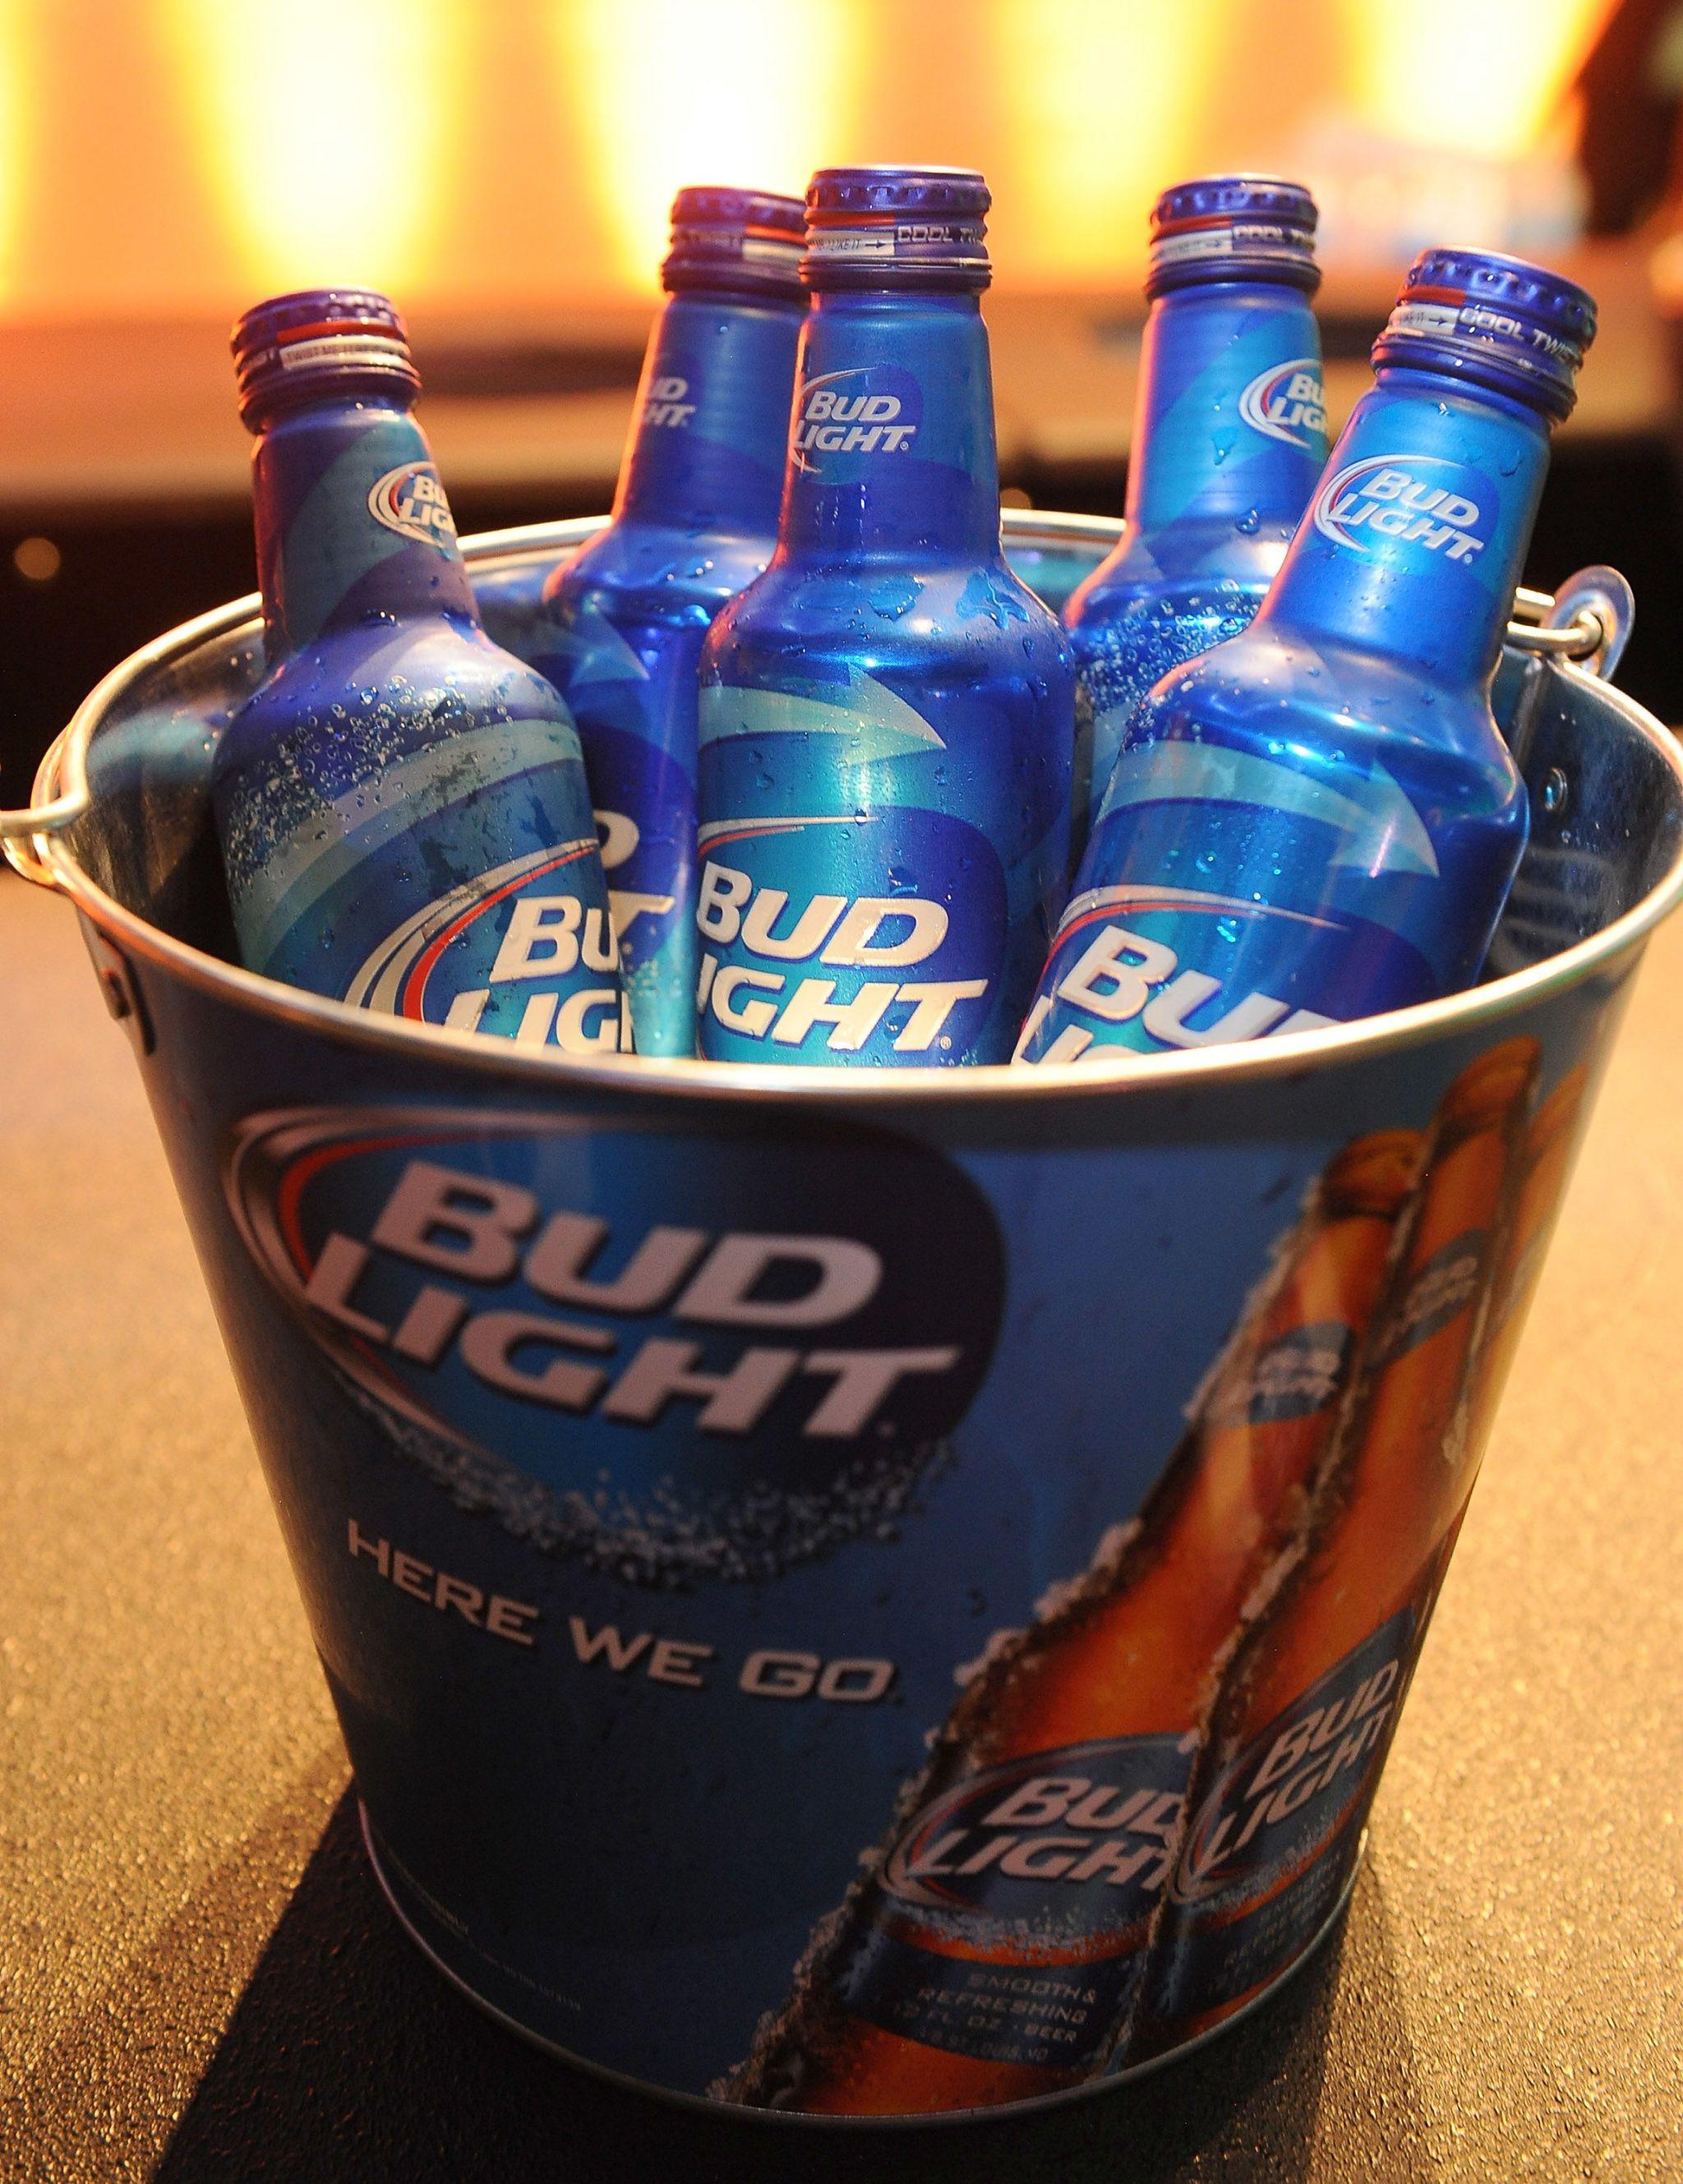 High Quality Bud Light Apologises After Ad Slogan Is Accused Of Promoting U0027rape Cultureu0027